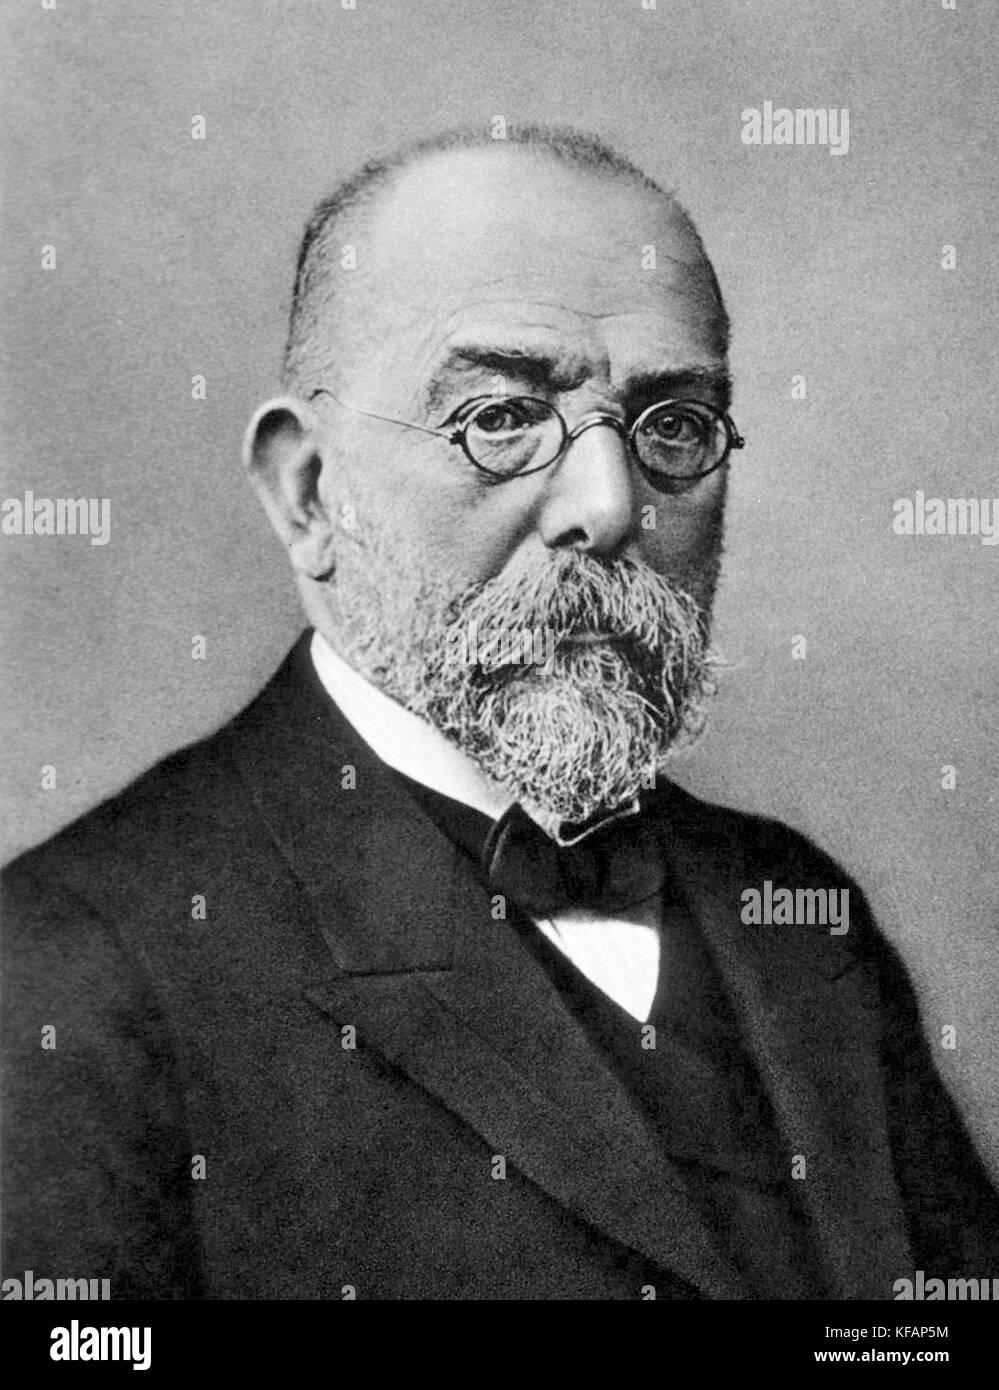 Robert Koch, Robert Heinrich Hermann Koch, German physician and pioneering microbiologist. - Stock Image